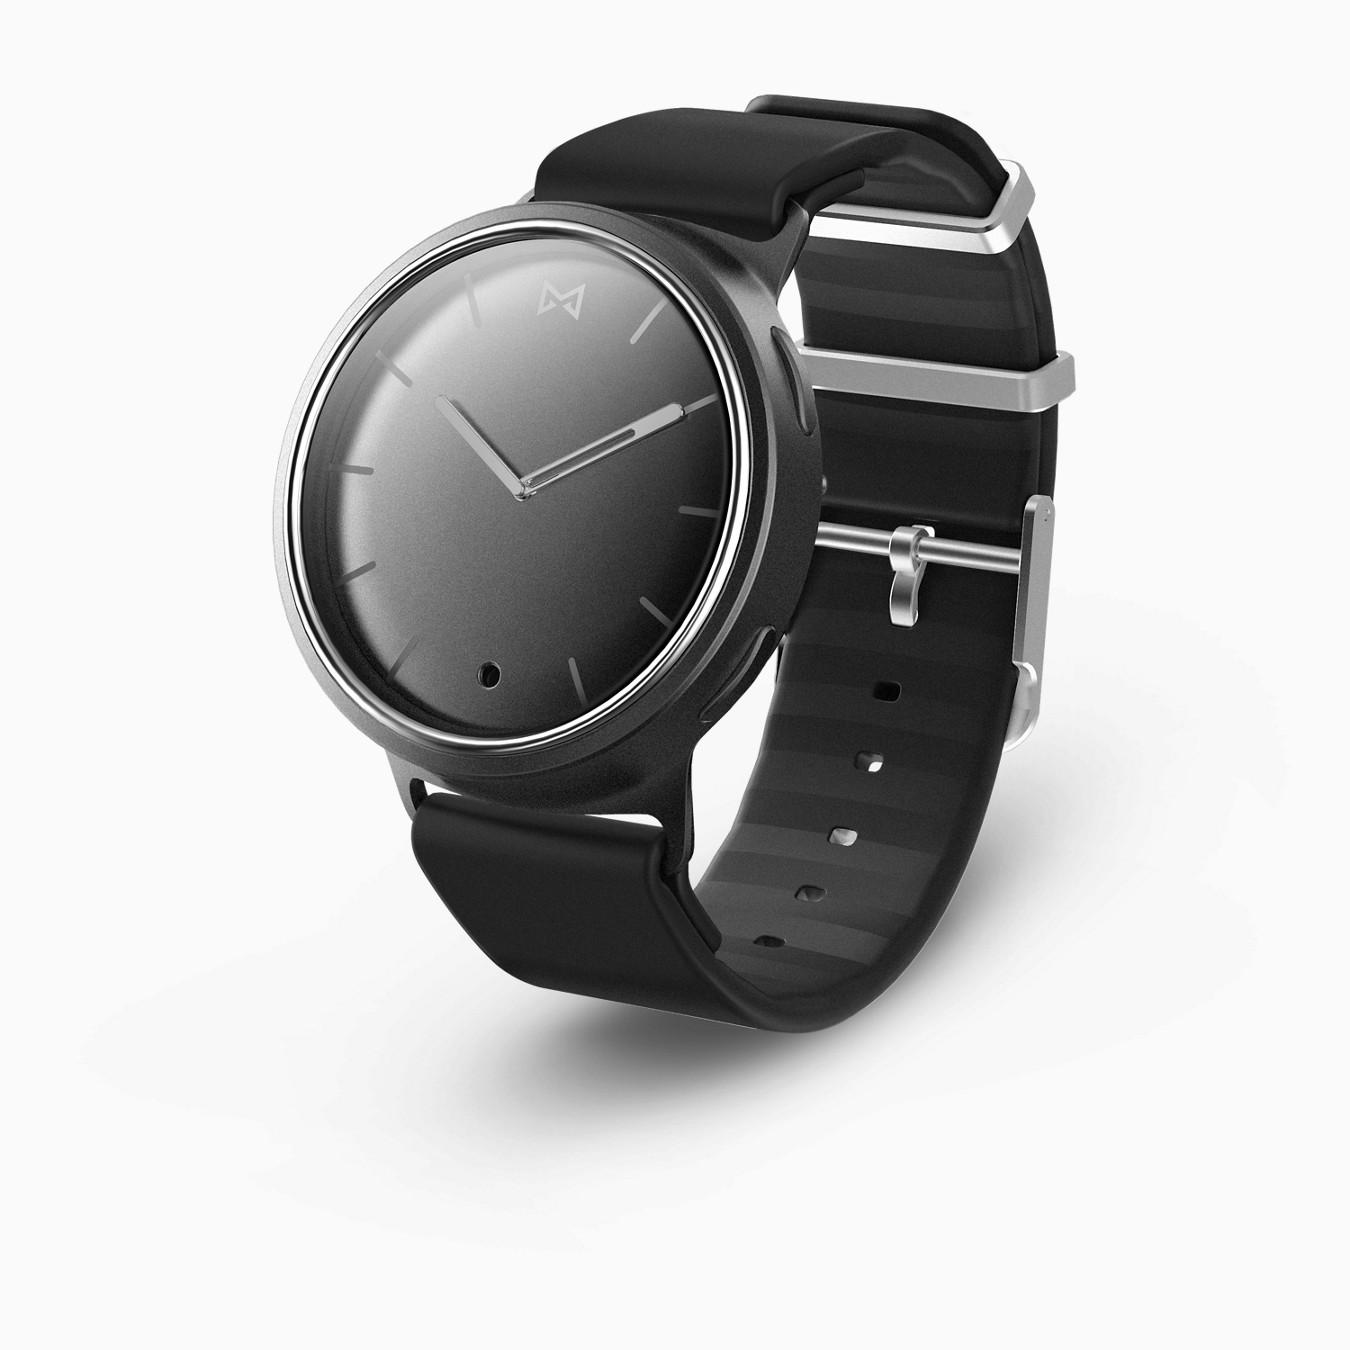 15. Misfit Phase Hybrid Smartwatch